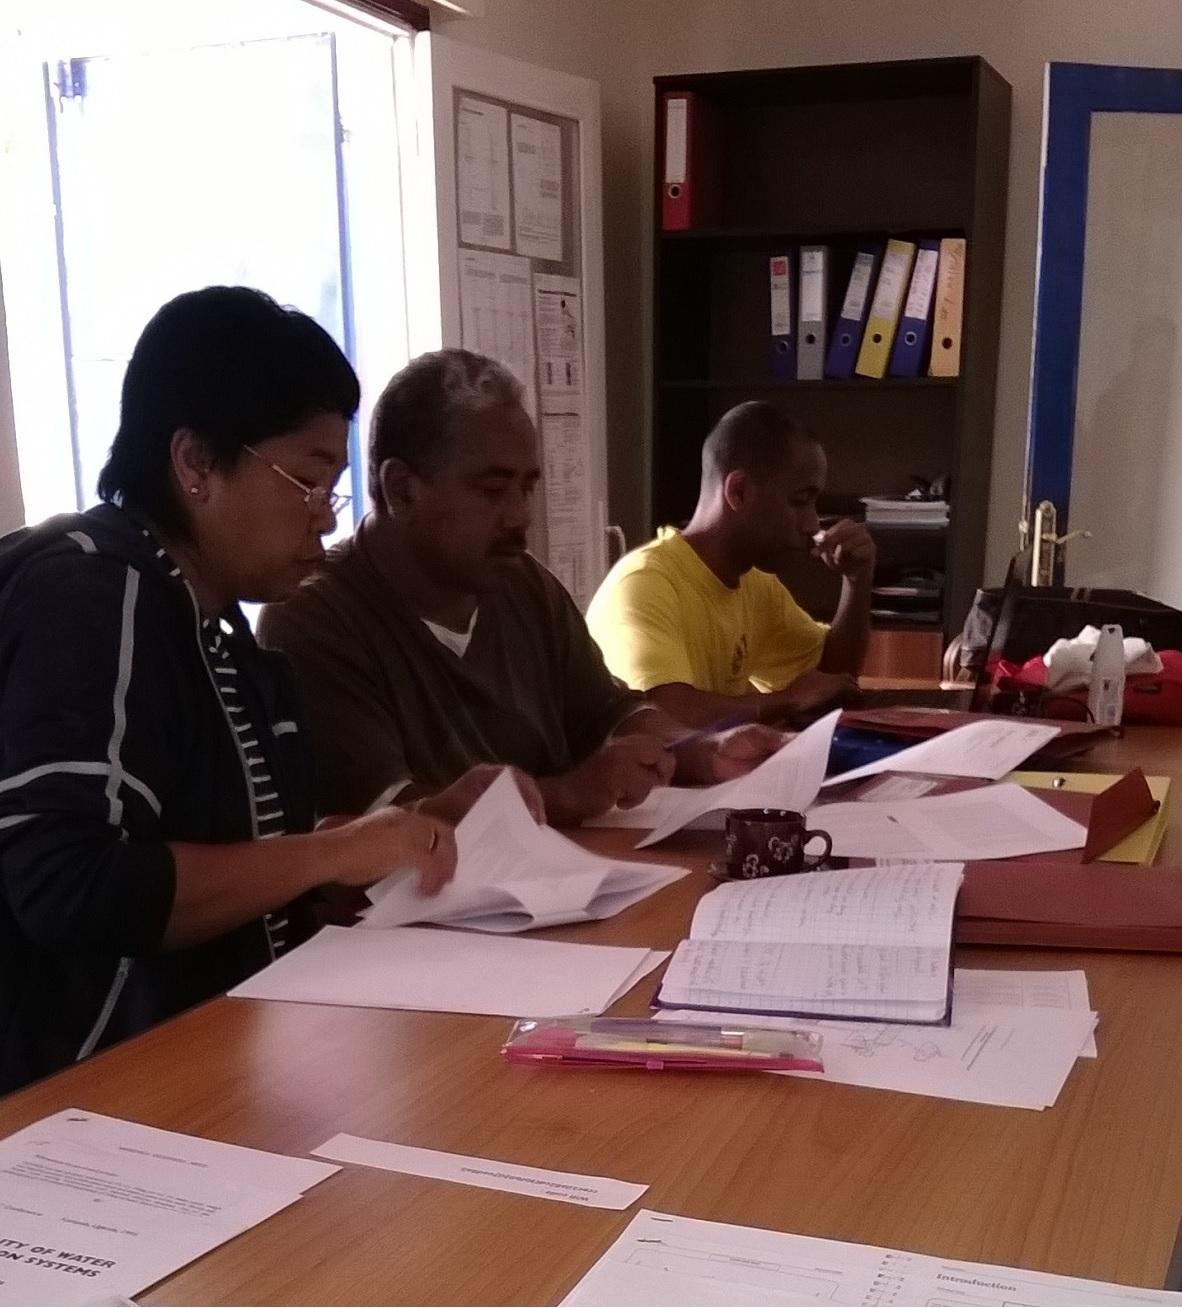 Classroom-based session, Madagascar 2014